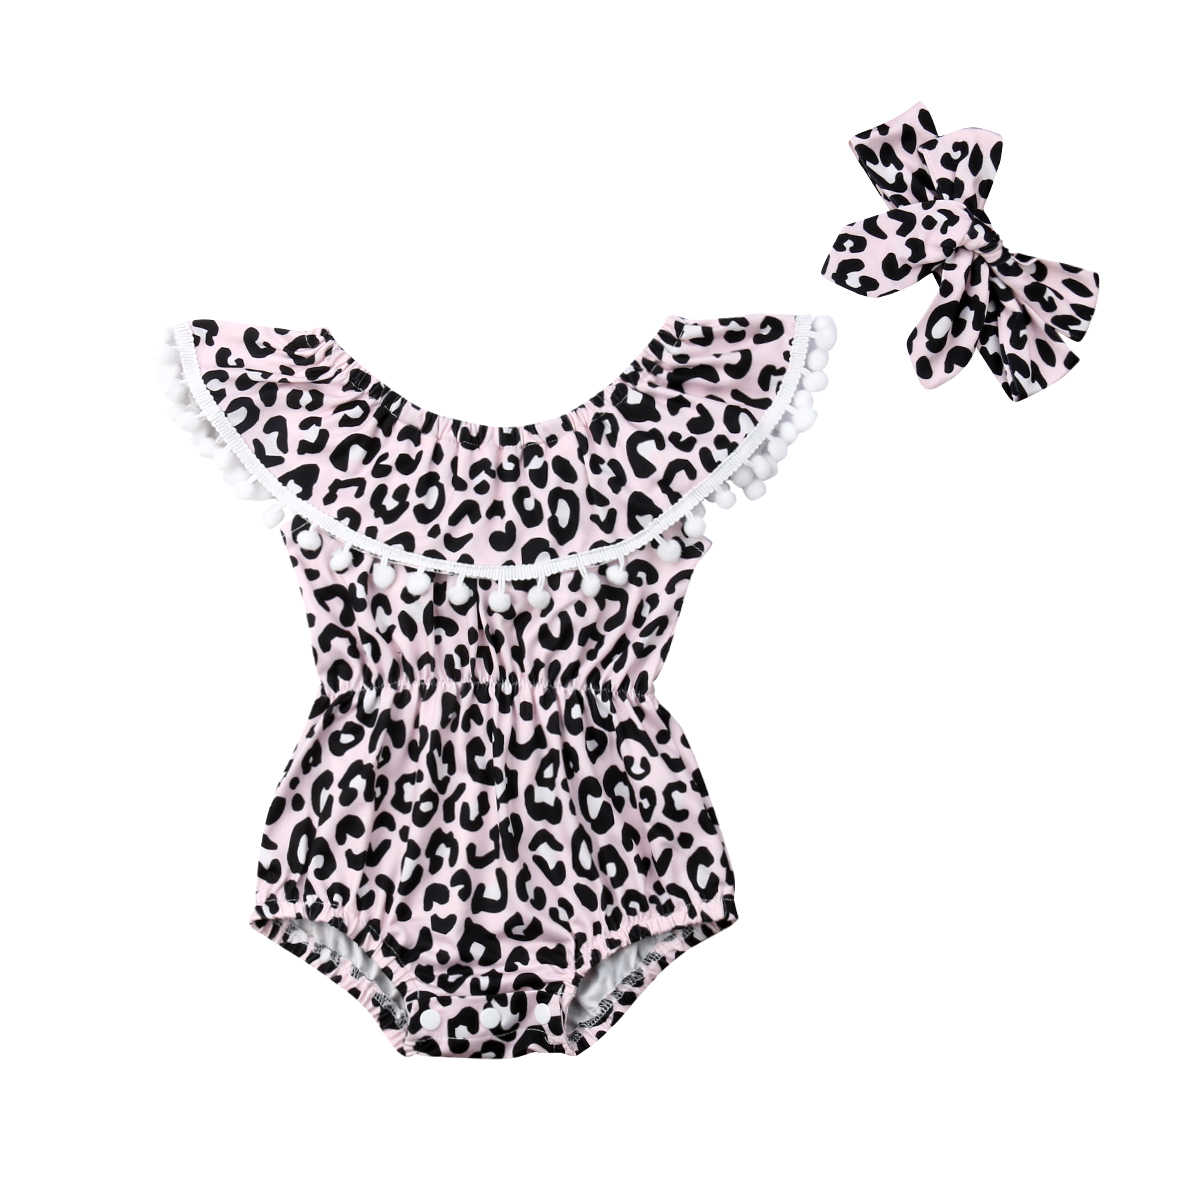 Fashion Newborn Baby Bodysuits Cute Little Baby Leopard Print Ball Outfits Infant Children Summer Jumpsuits+Headbands 2Pcs Suit